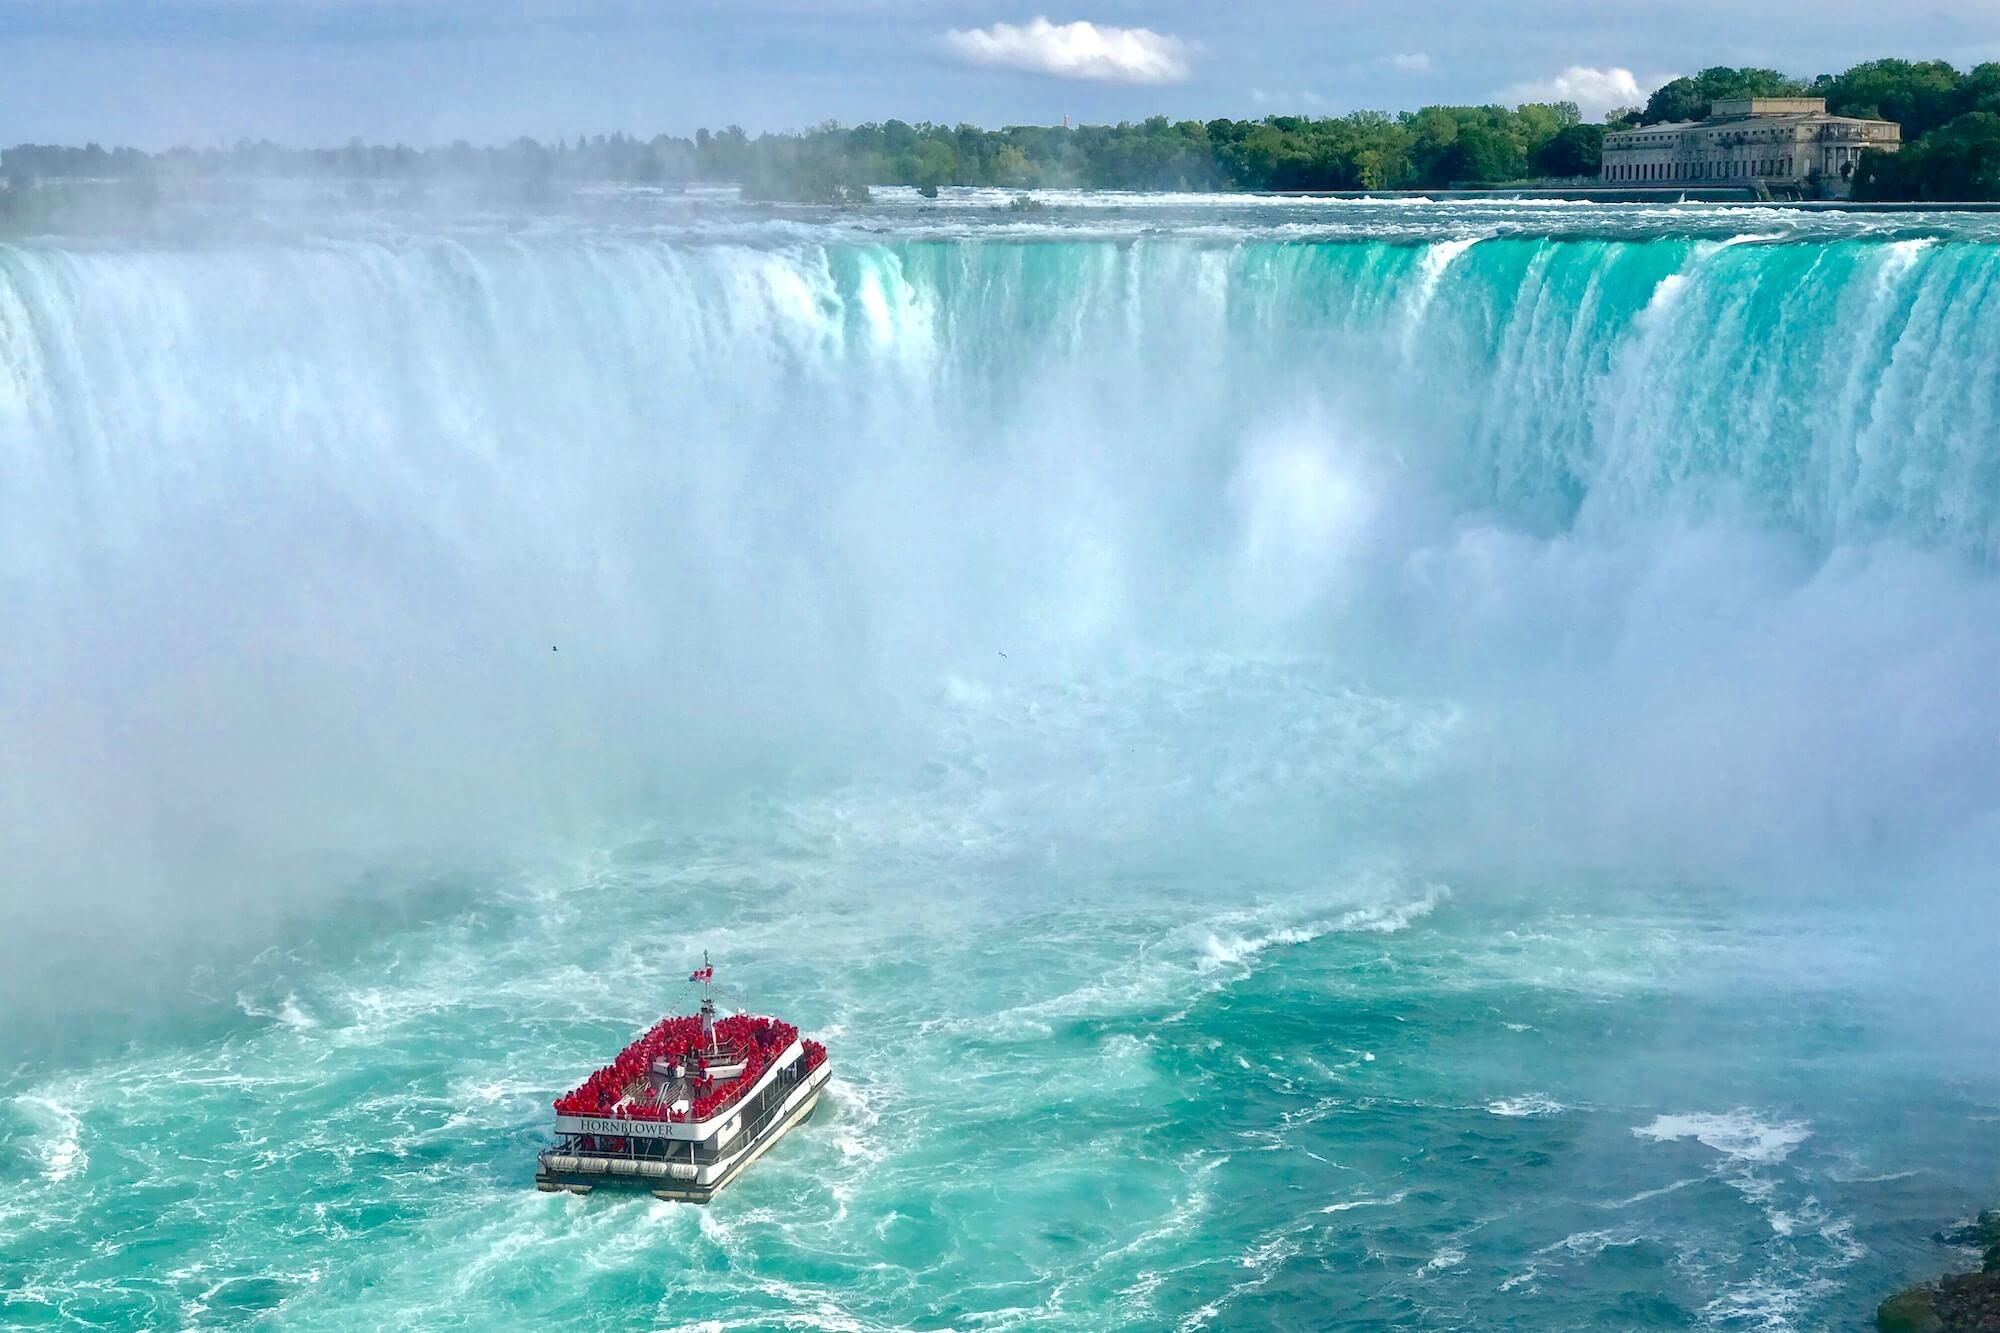 Boat on Niagara Falls